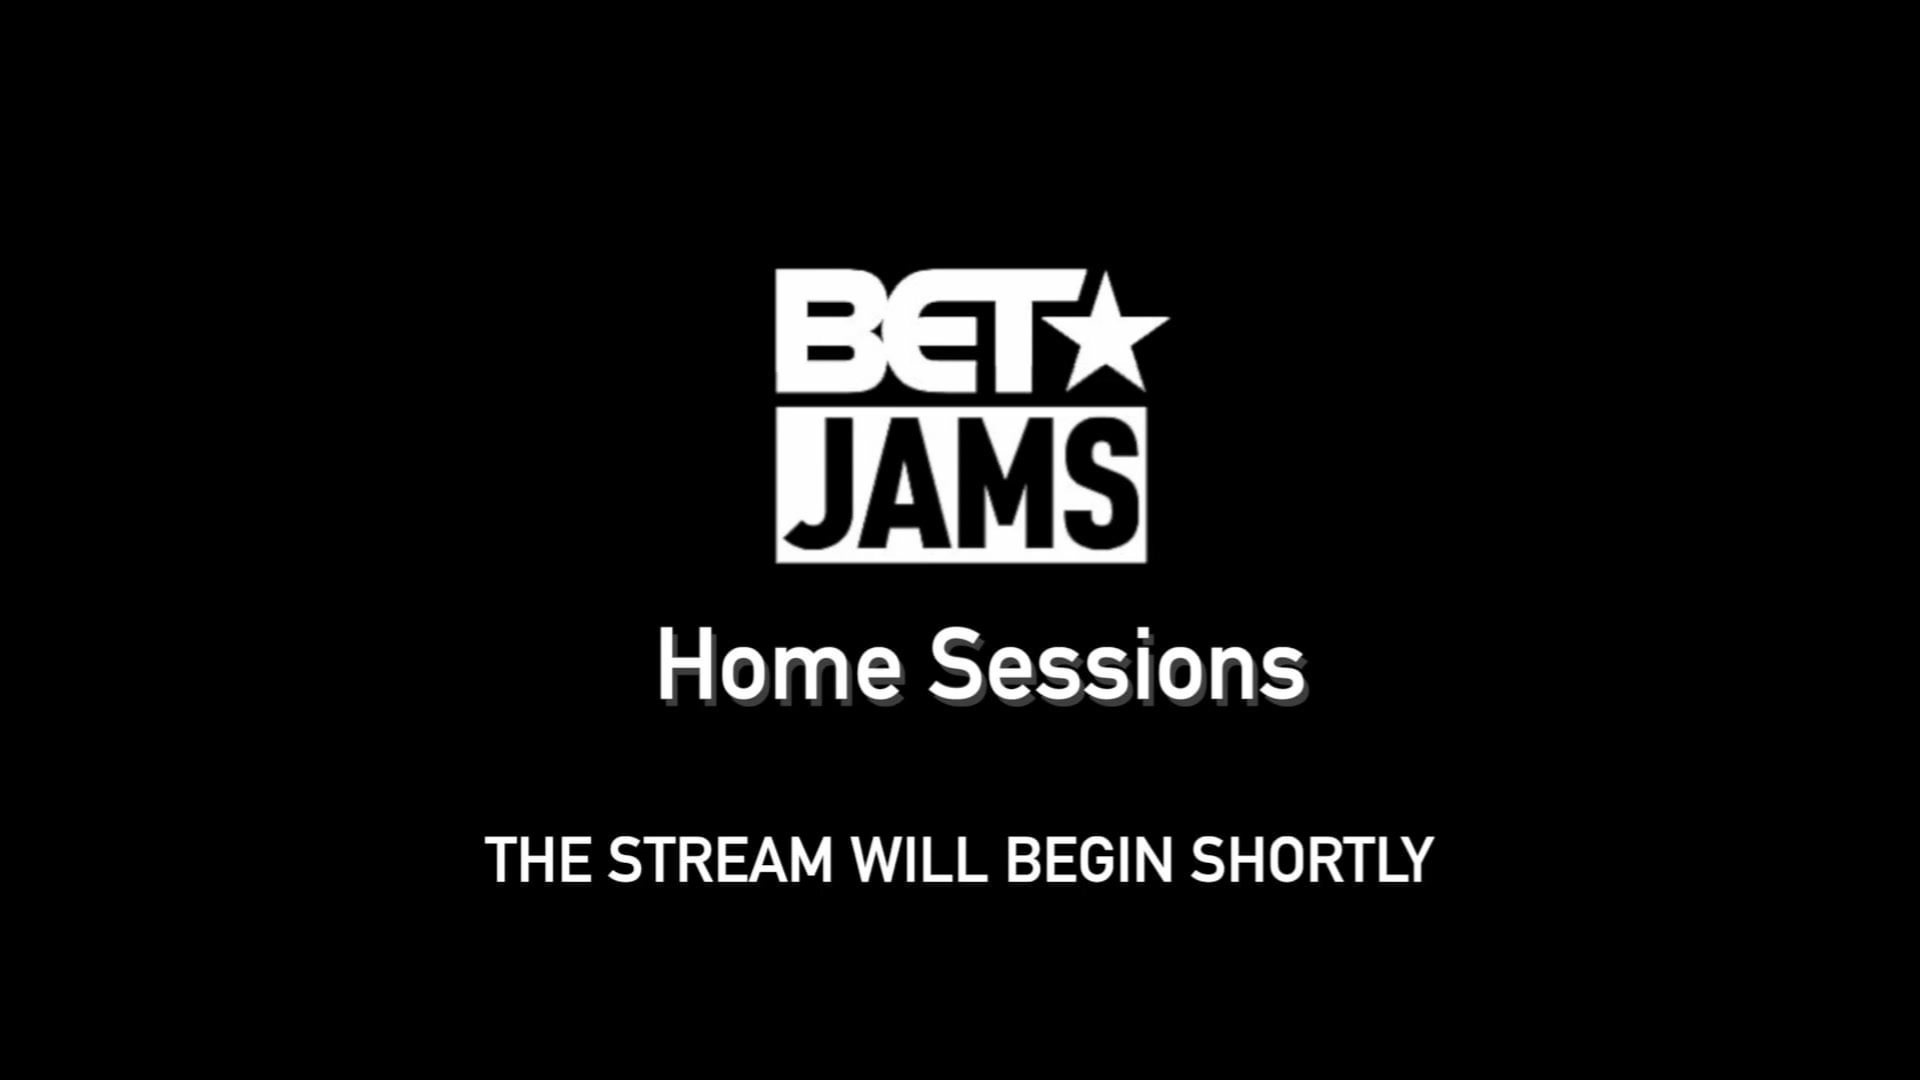 Caiiro, DJ Nana & The Rhythm Sessions – Bet Jams Home Sessions Mp3 download